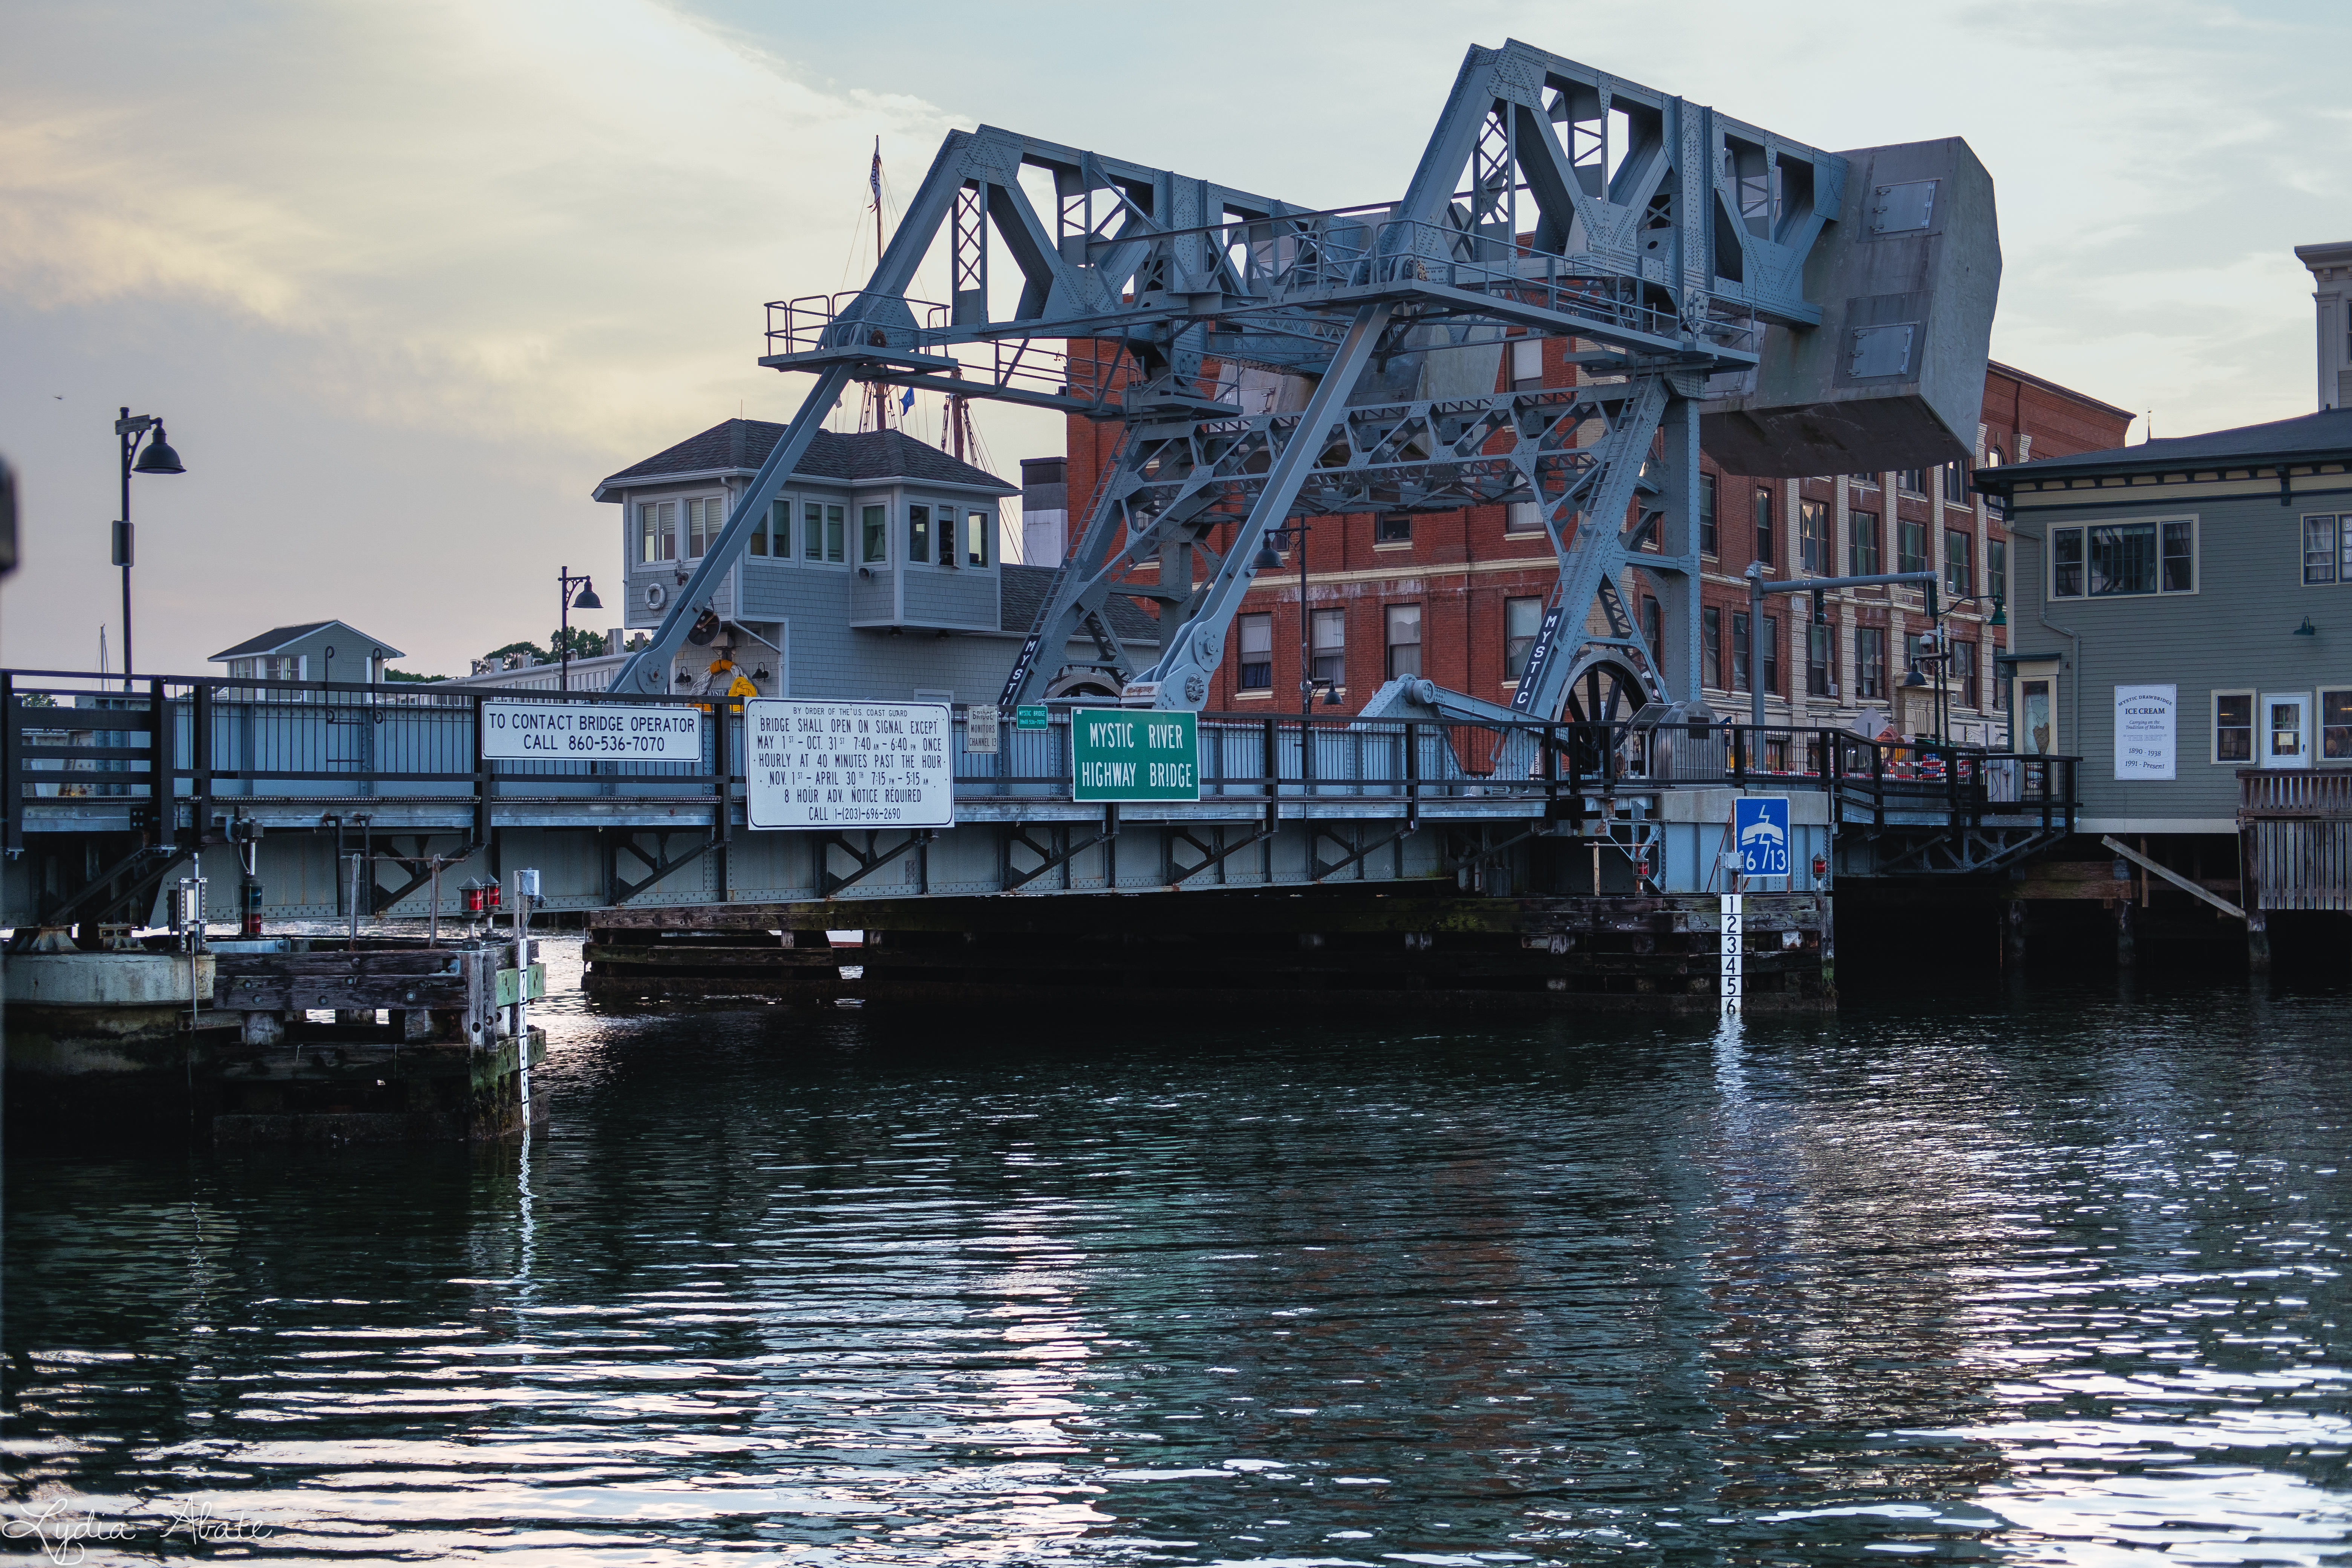 mystic river bridge-1.jpg